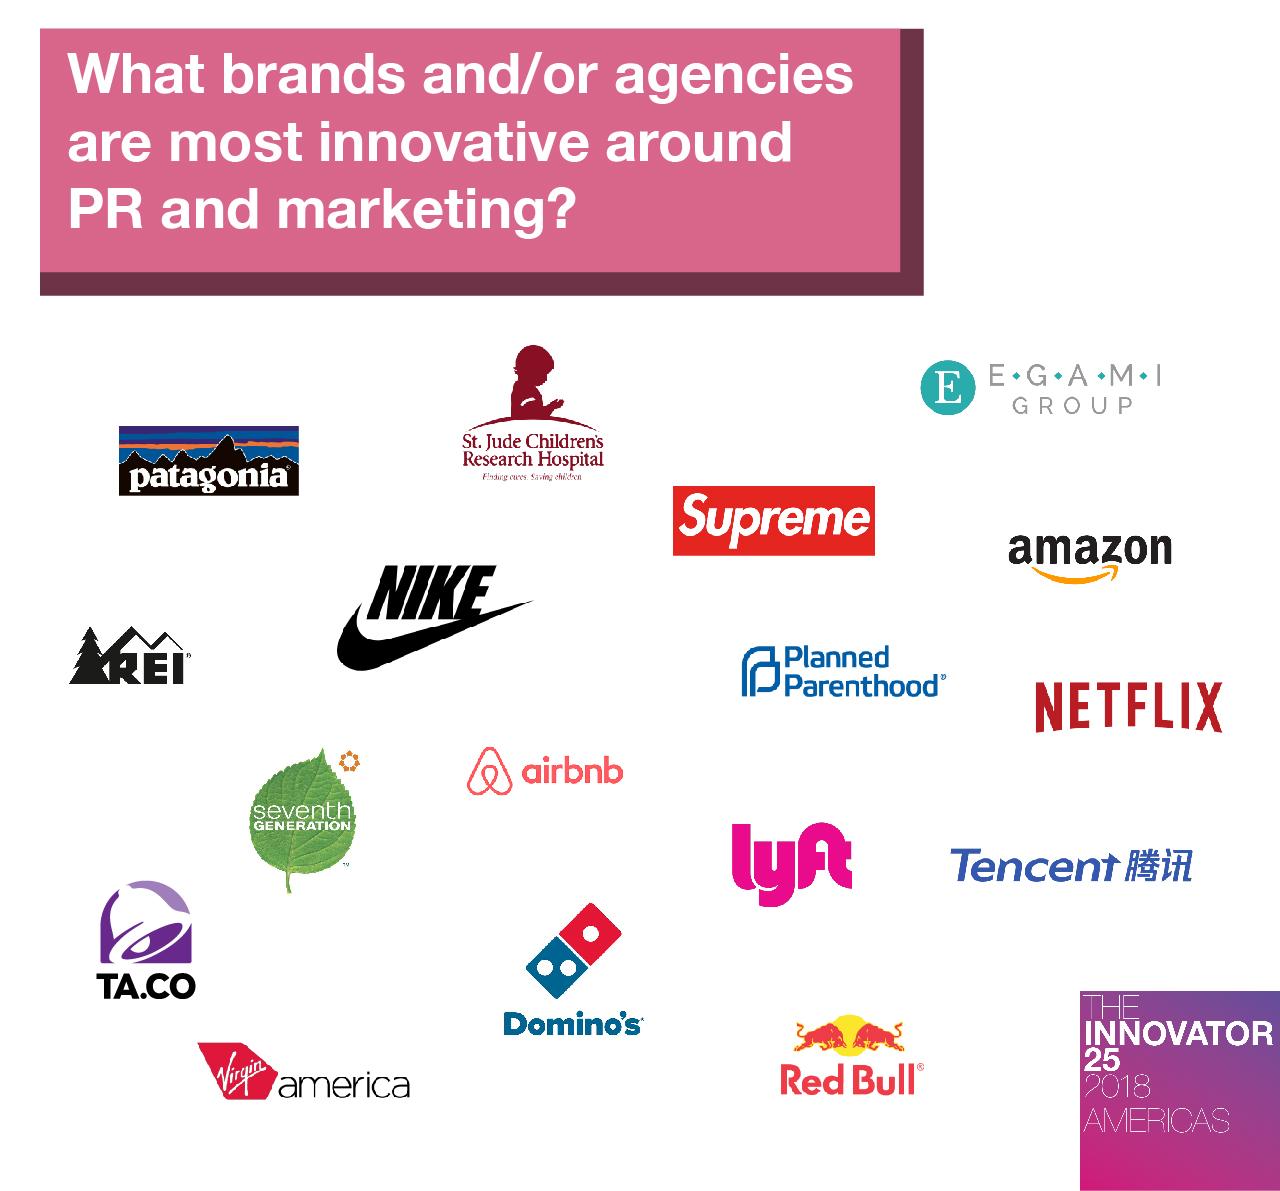 Innovator 25 Americas Brands